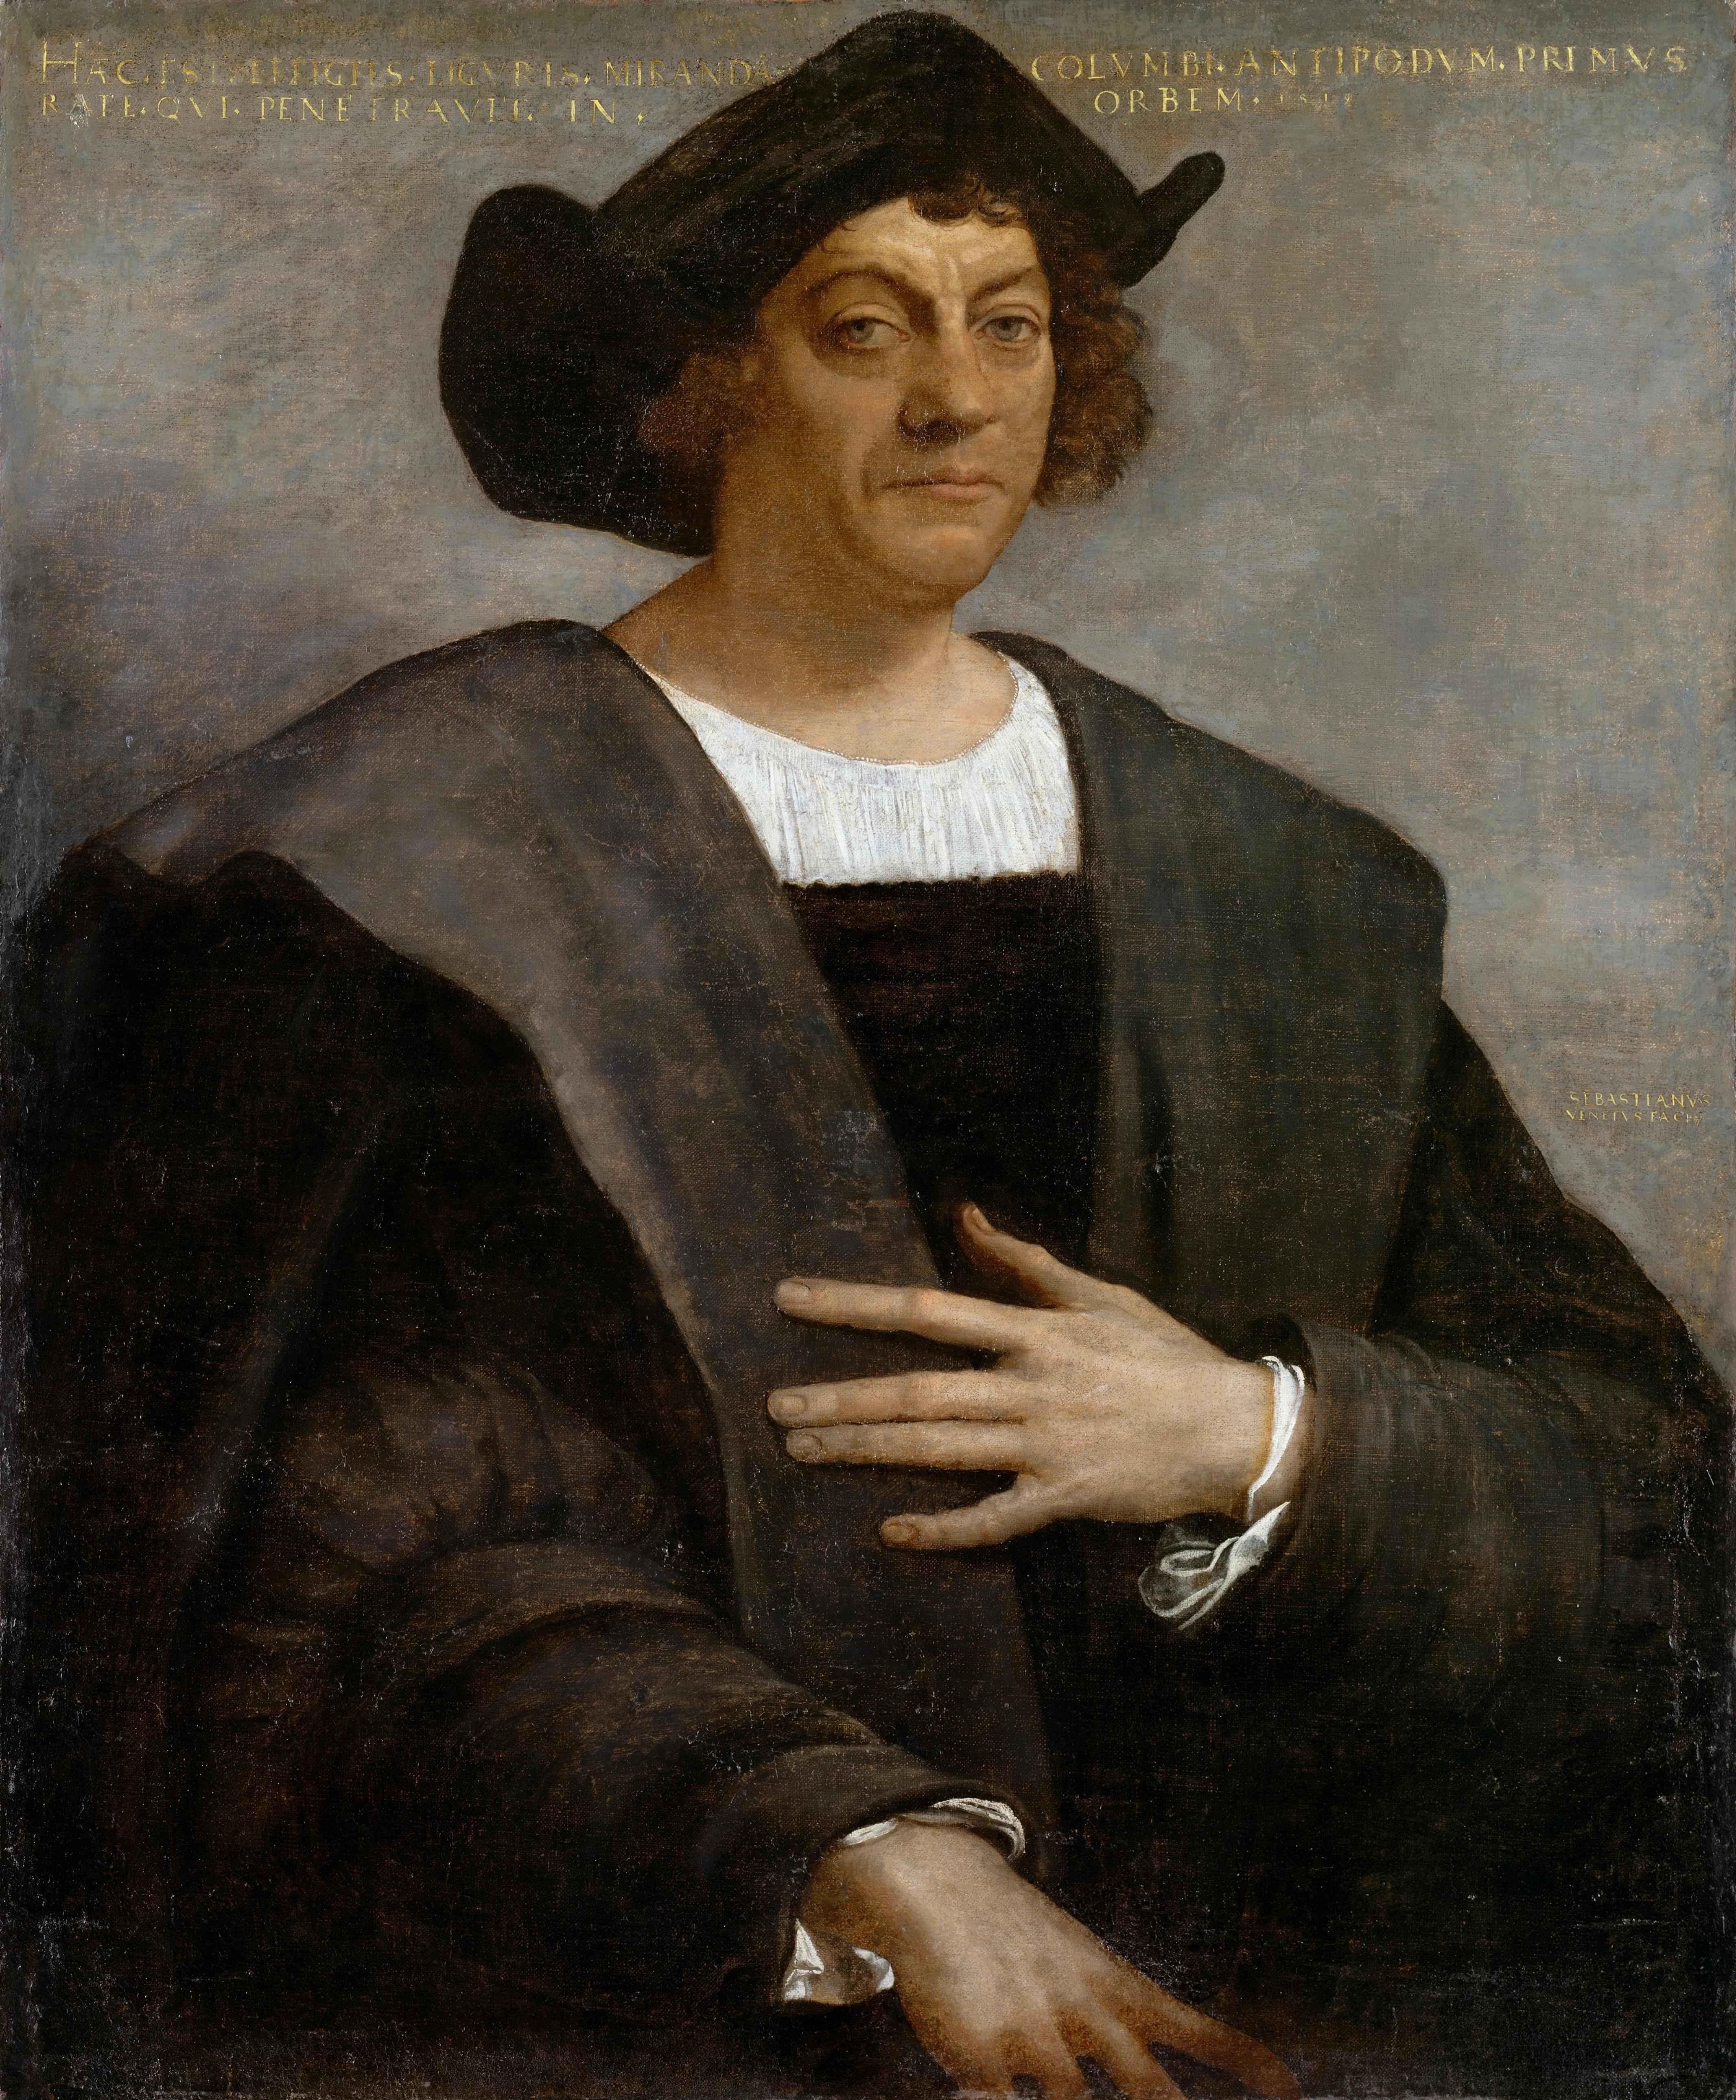 Cristofor Columb